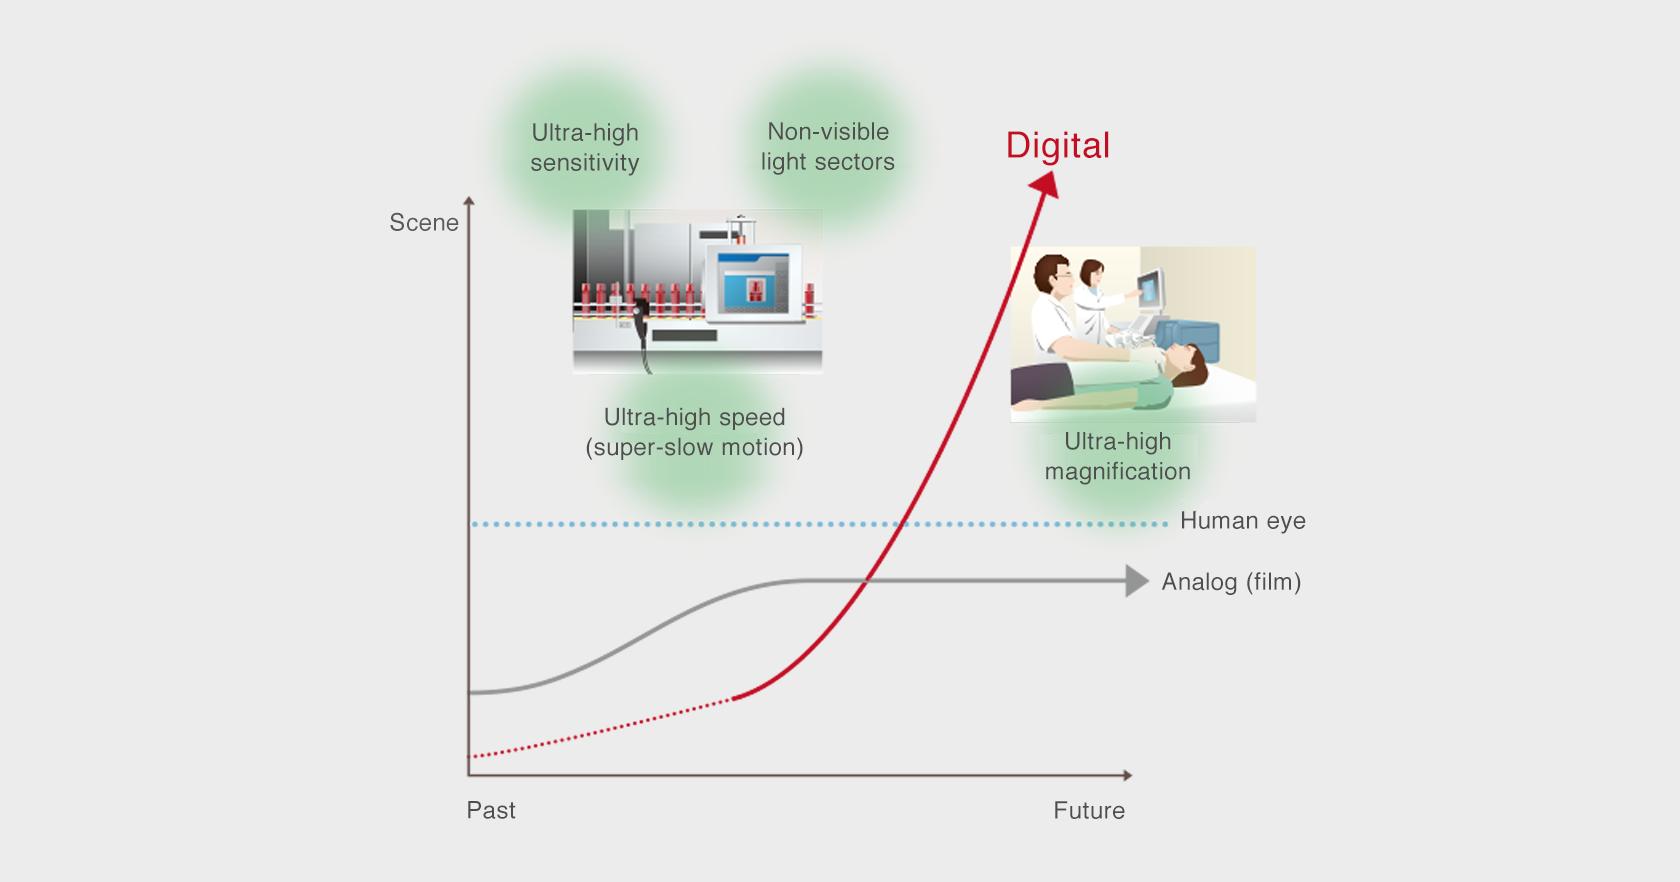 [image] Future Possibilities